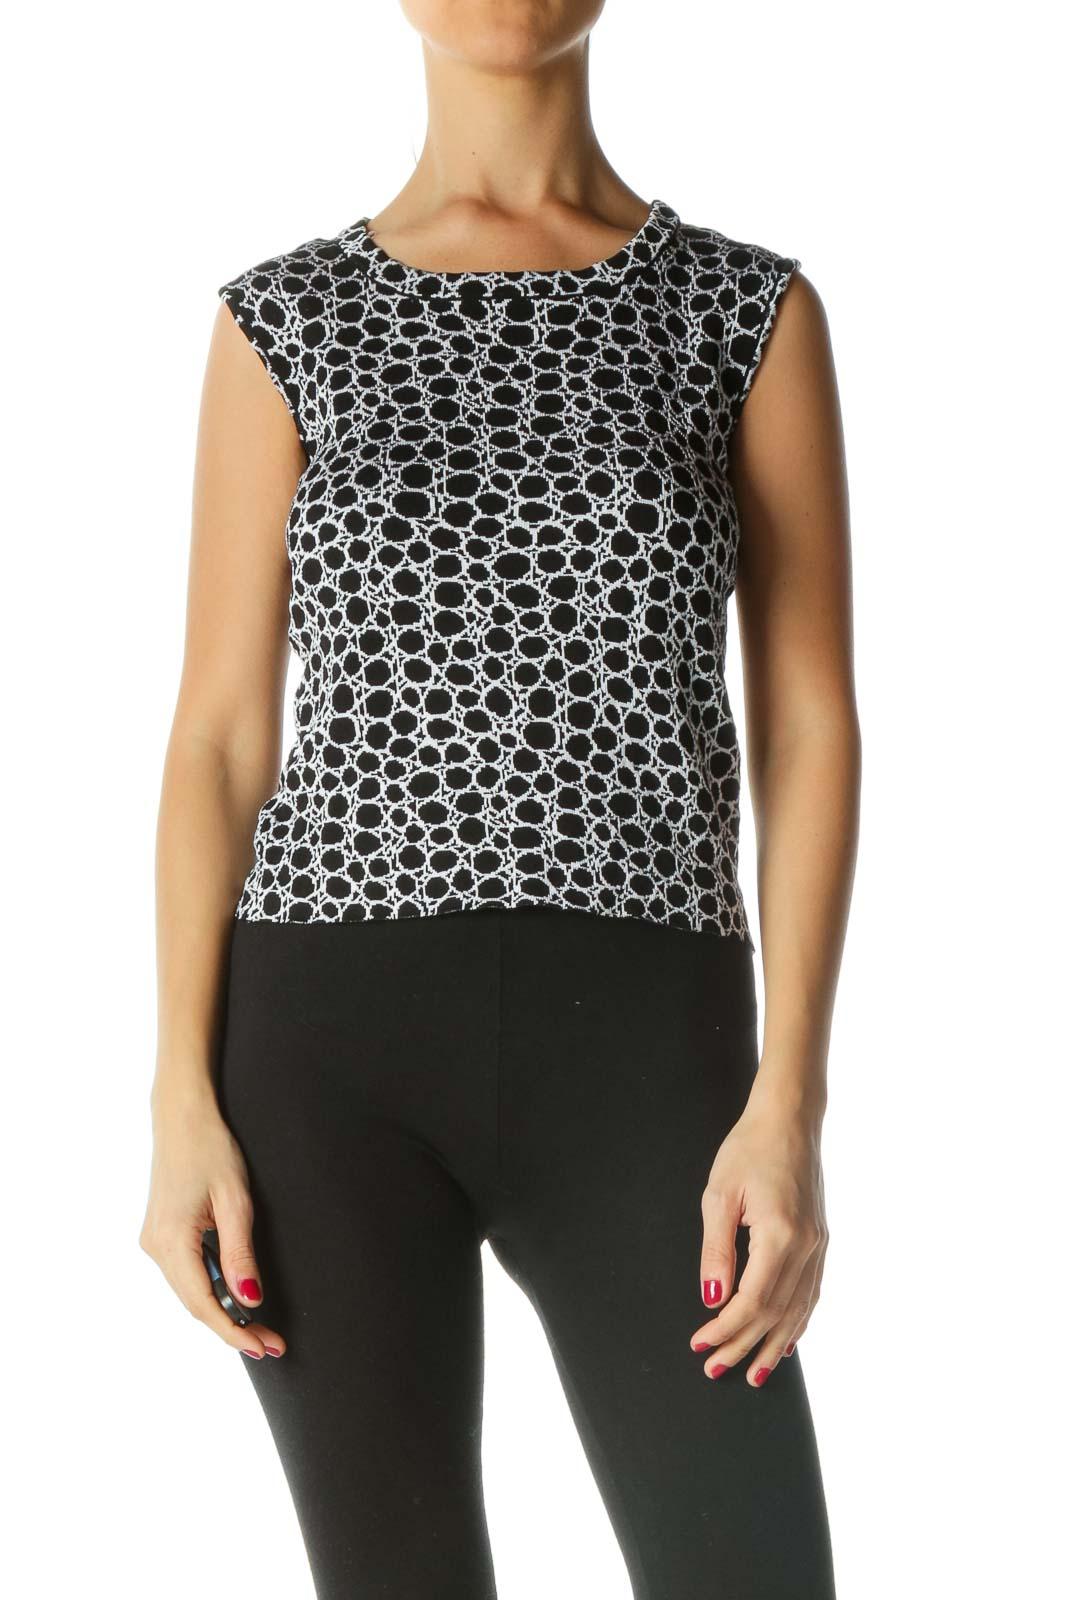 Black White Knitted Pattern Sleeveless Top